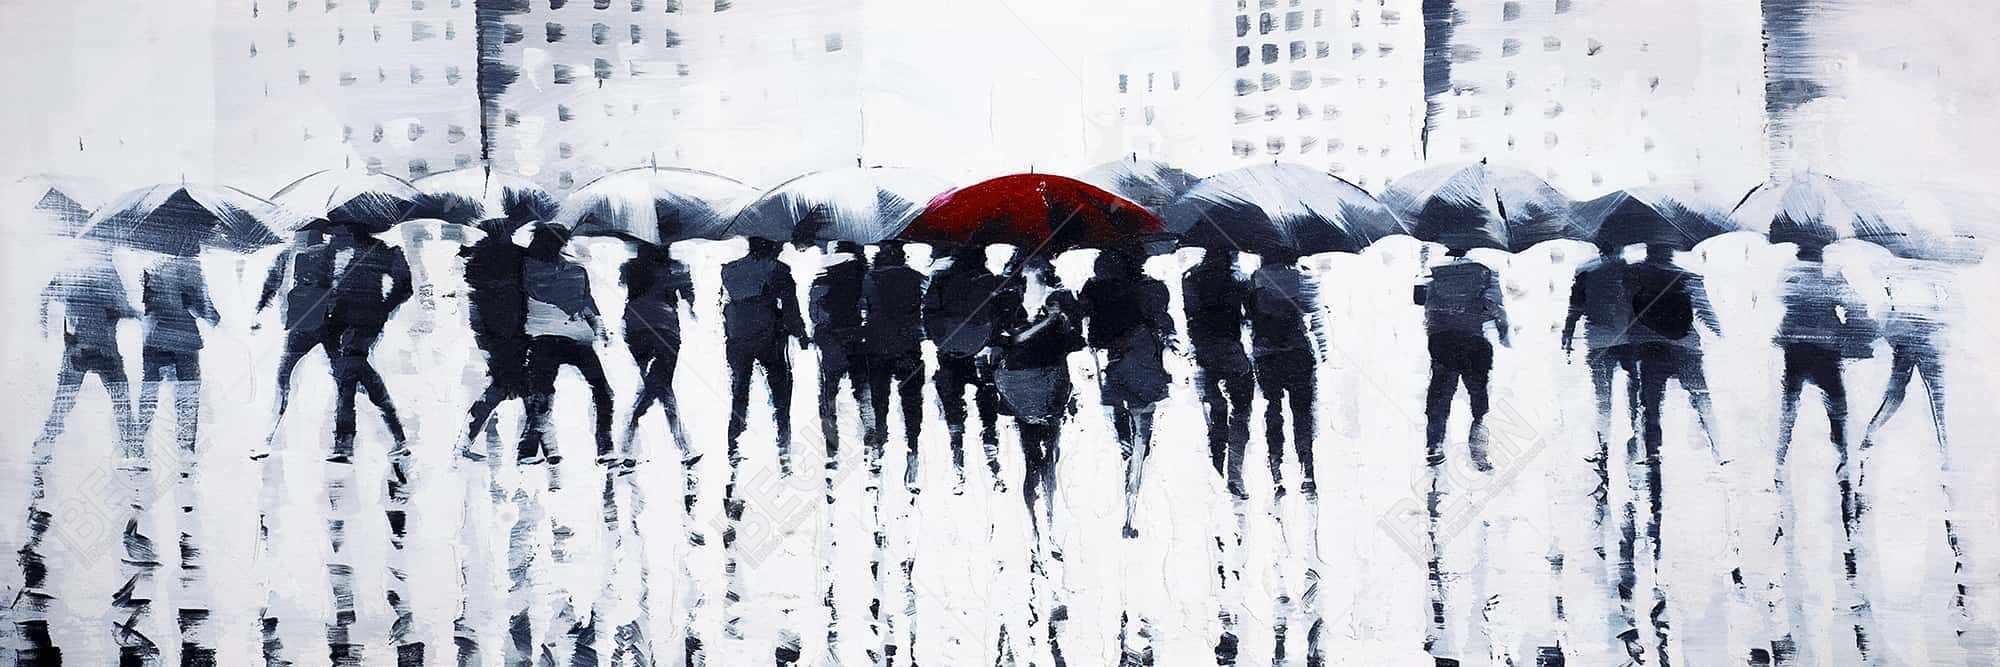 Silhouettes walking in the rain